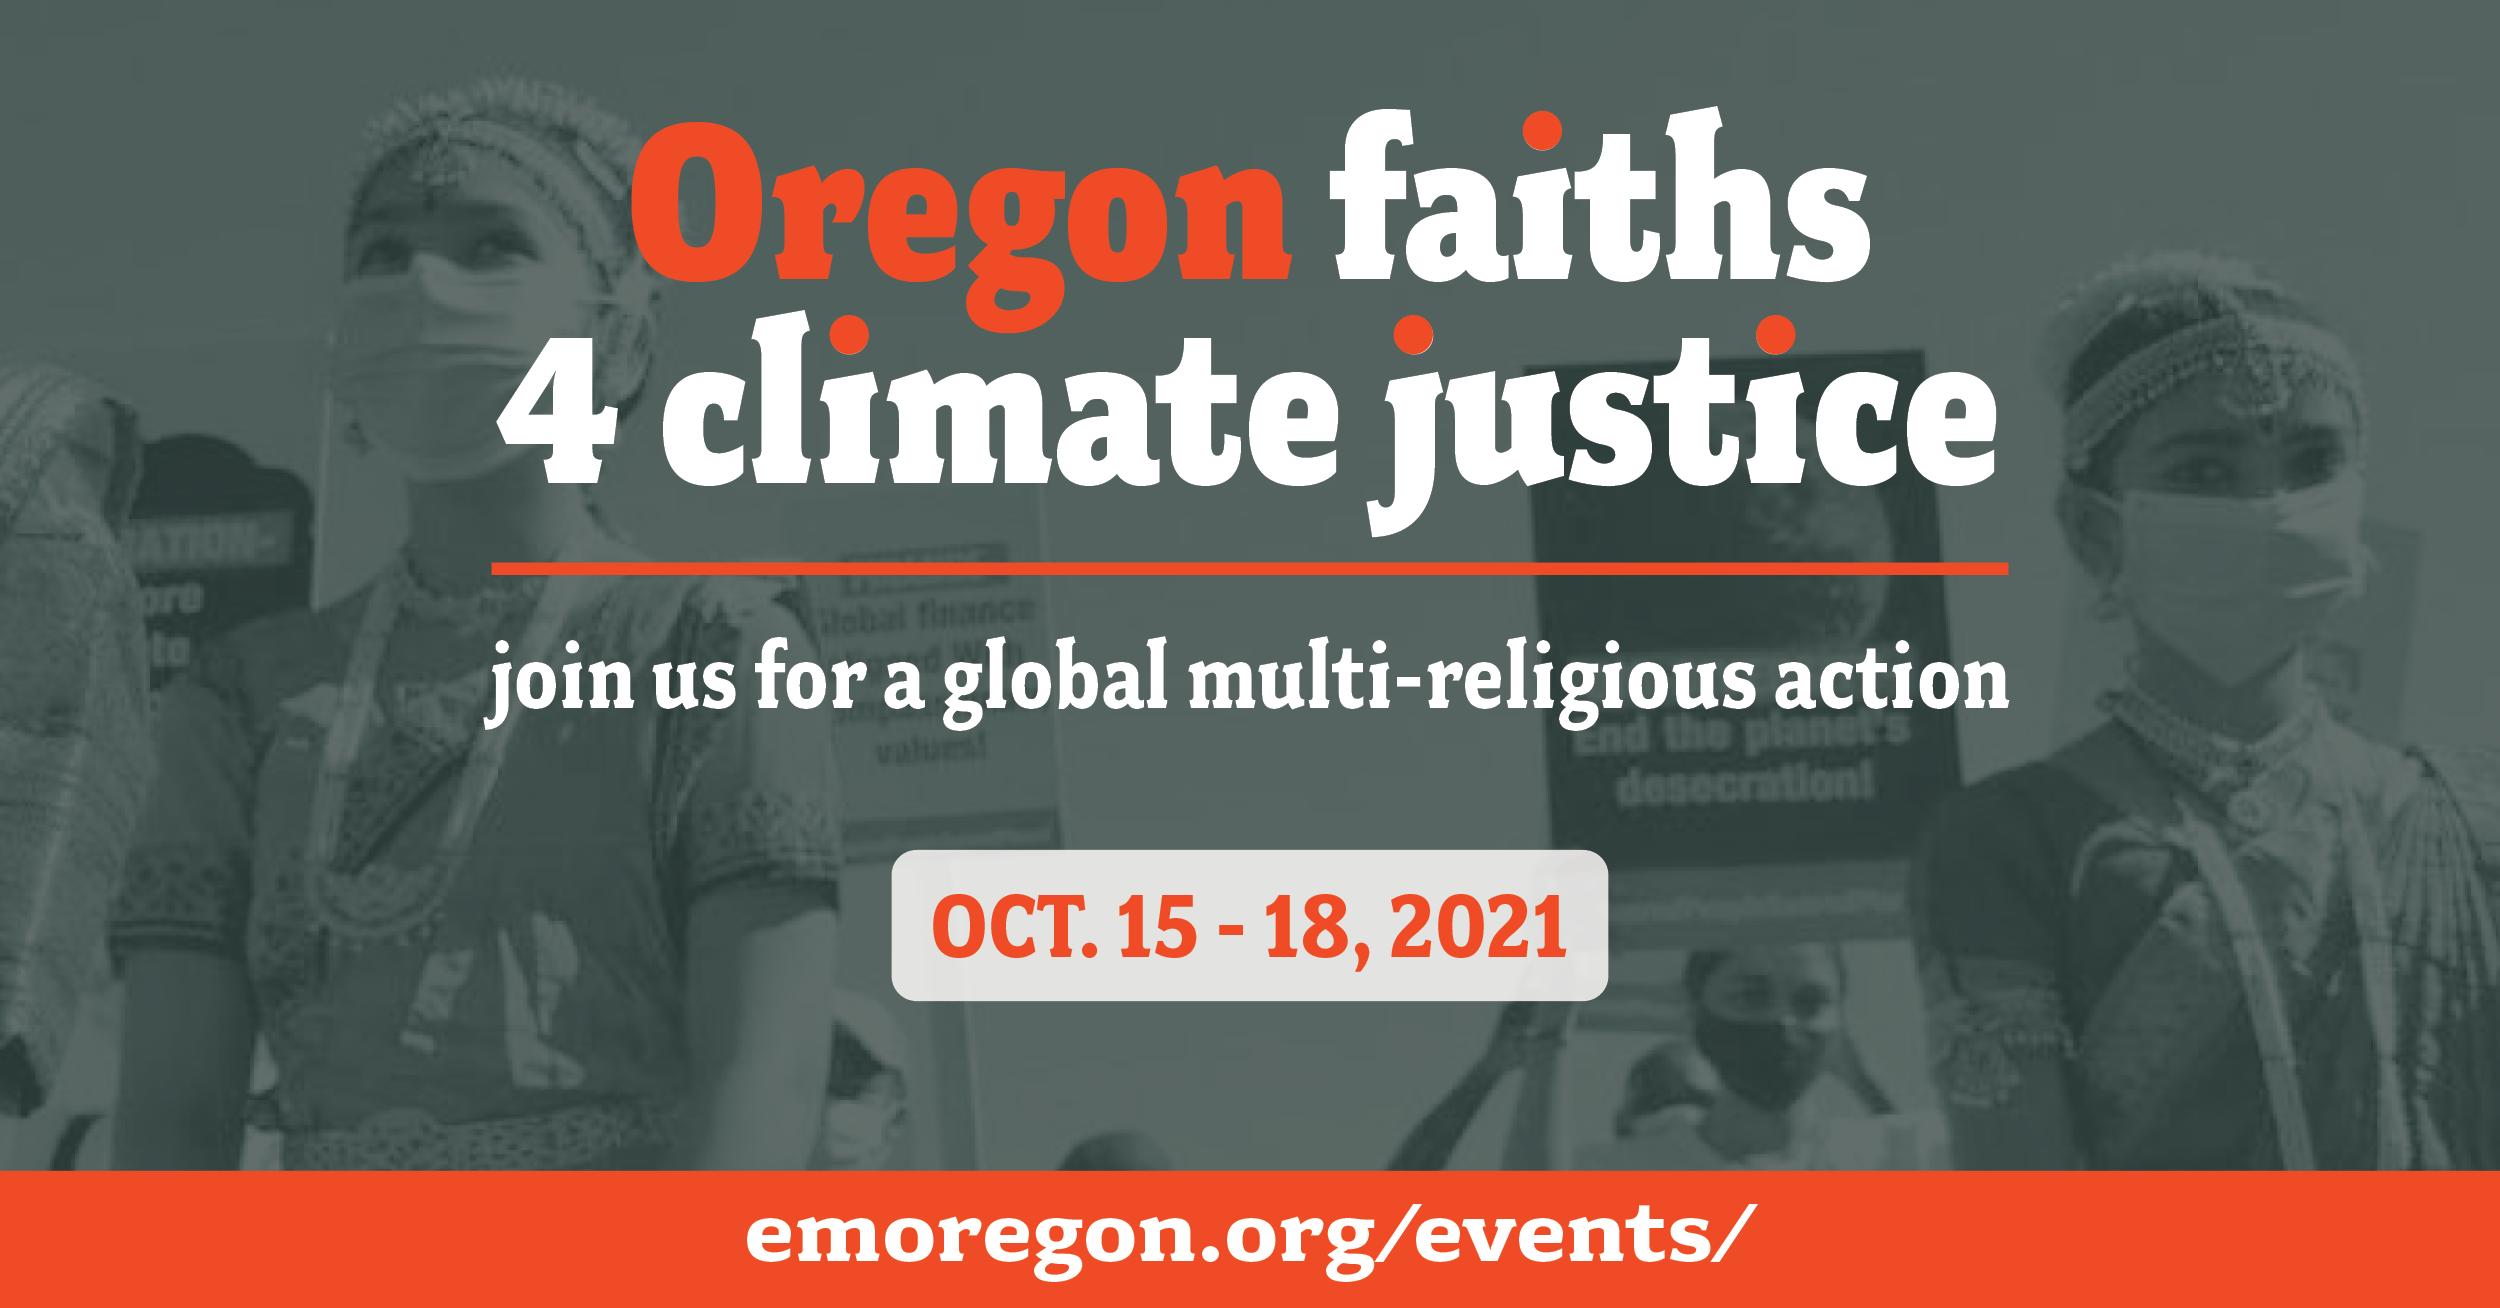 Oregon faiths 4 climate justice